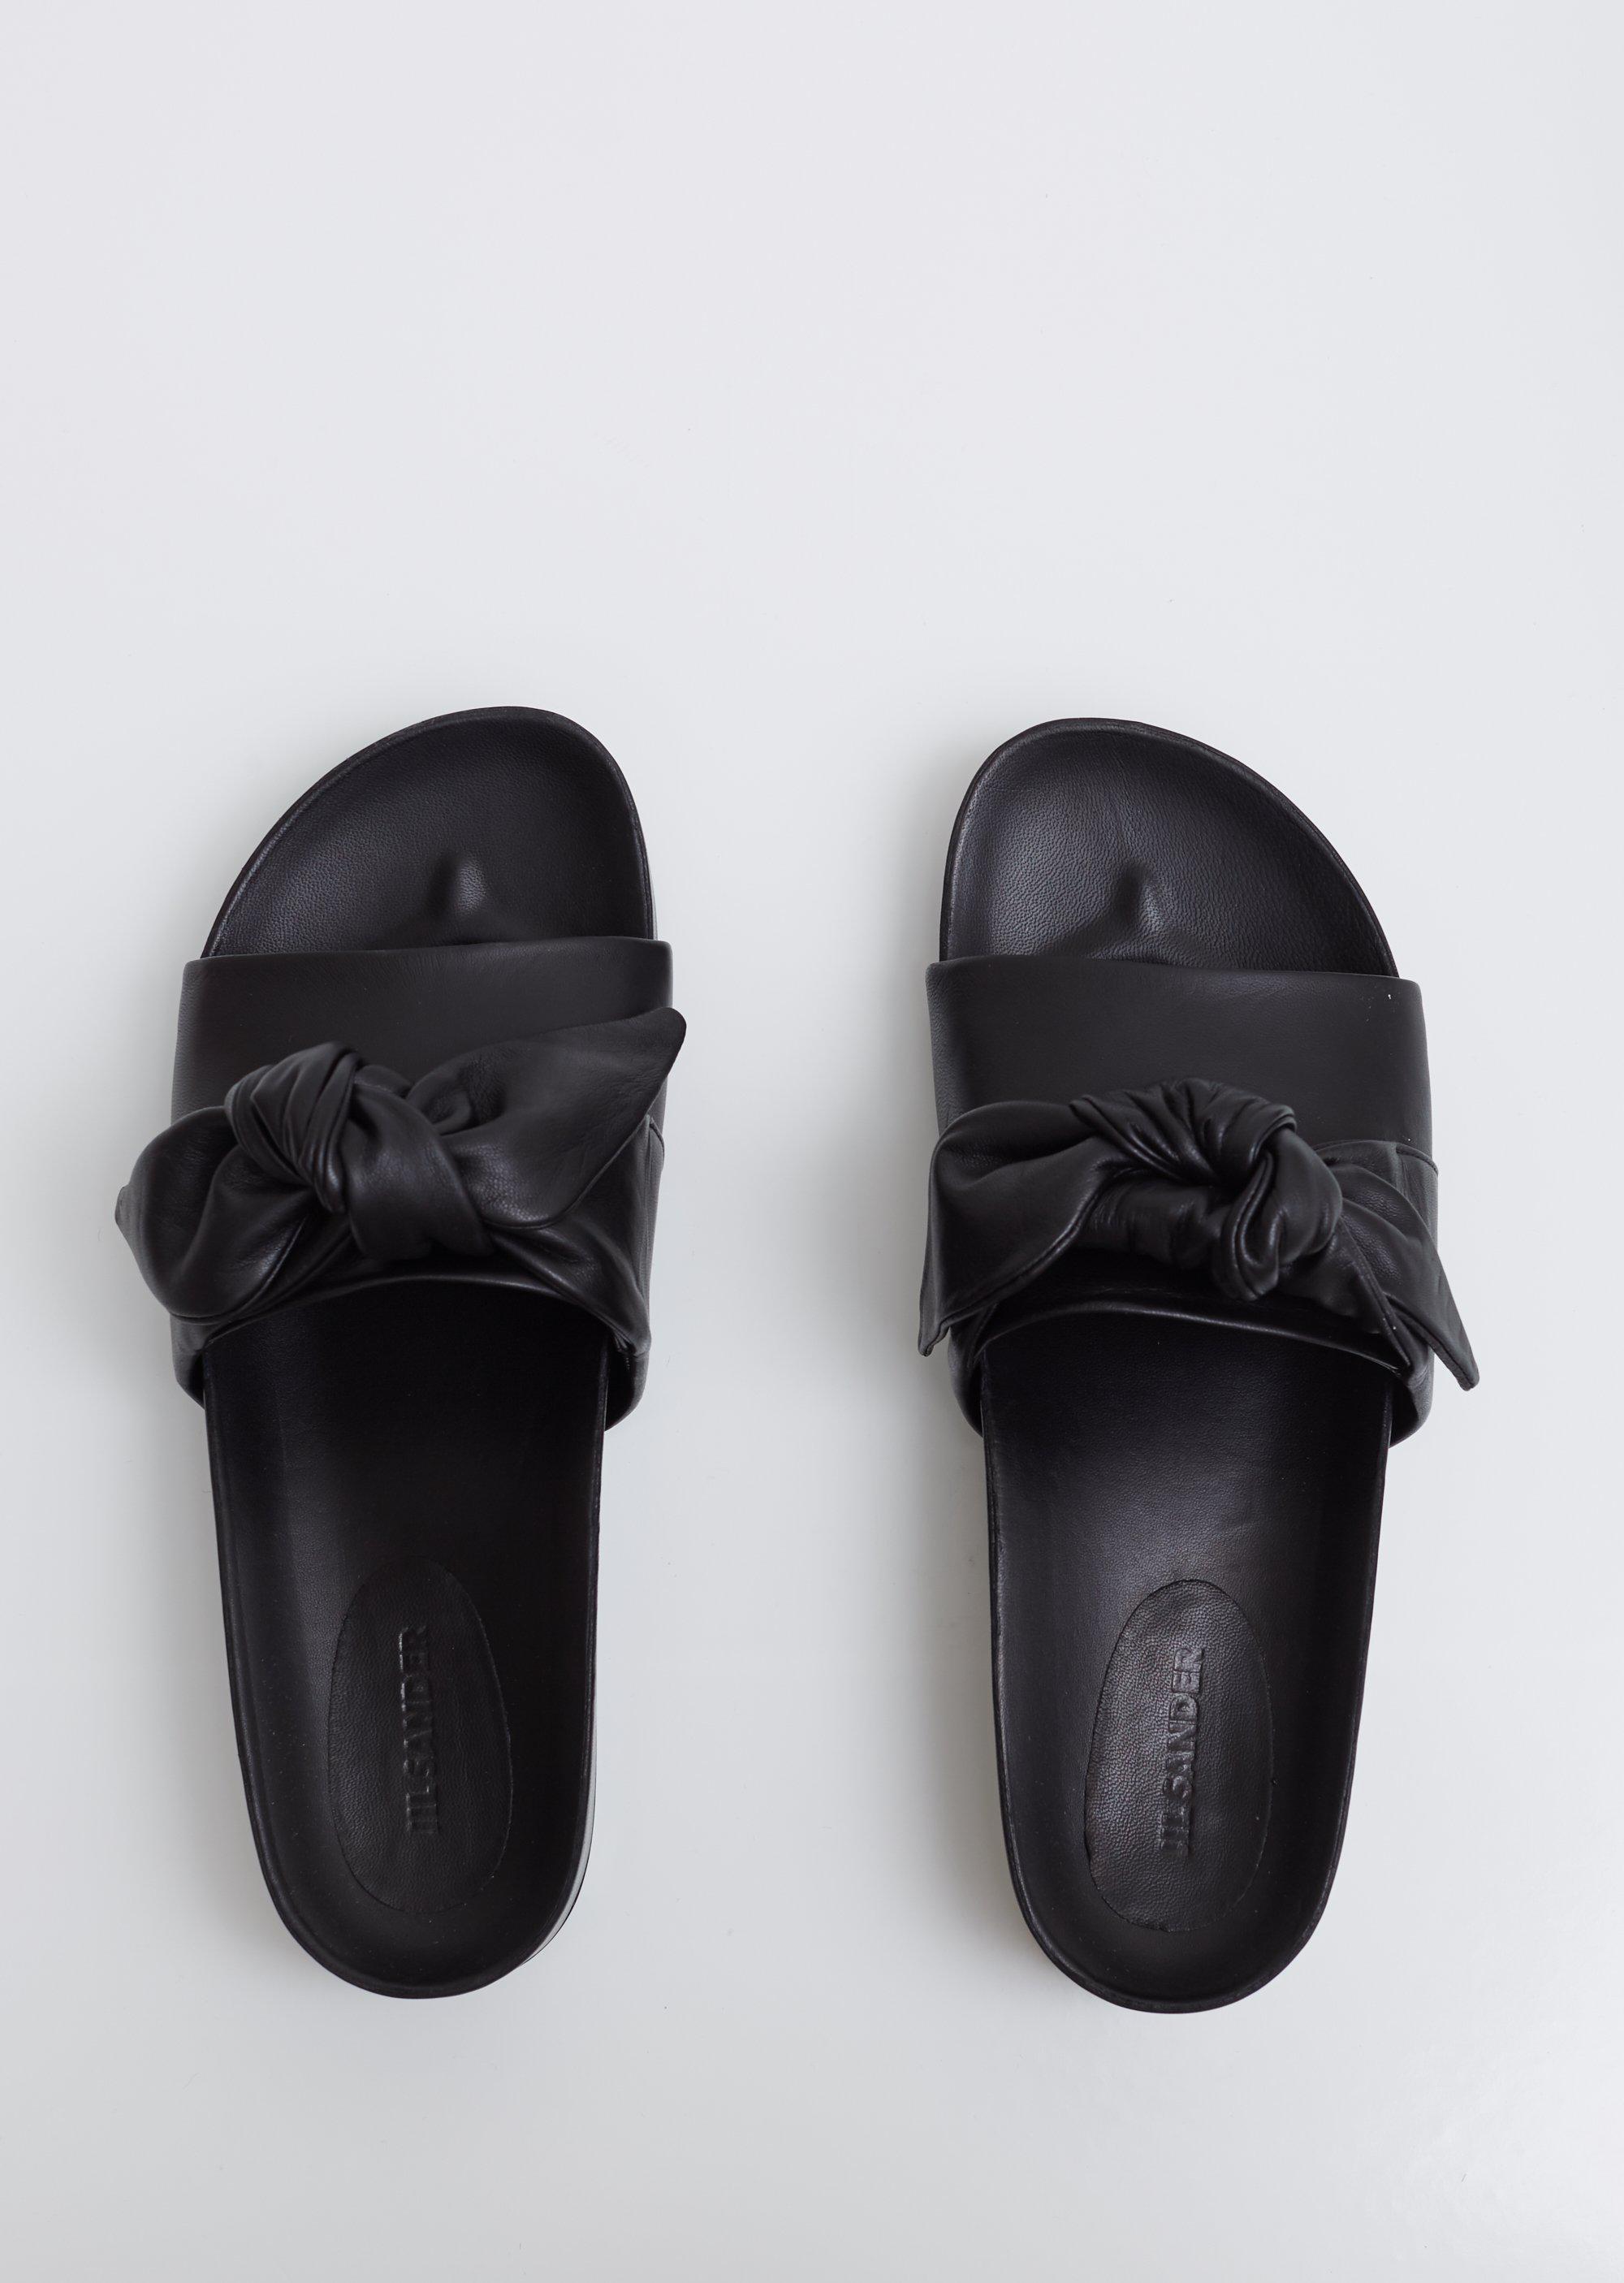 b74cb63a7b30 Lyst - Jil Sander Knotted Leather Slides in Black